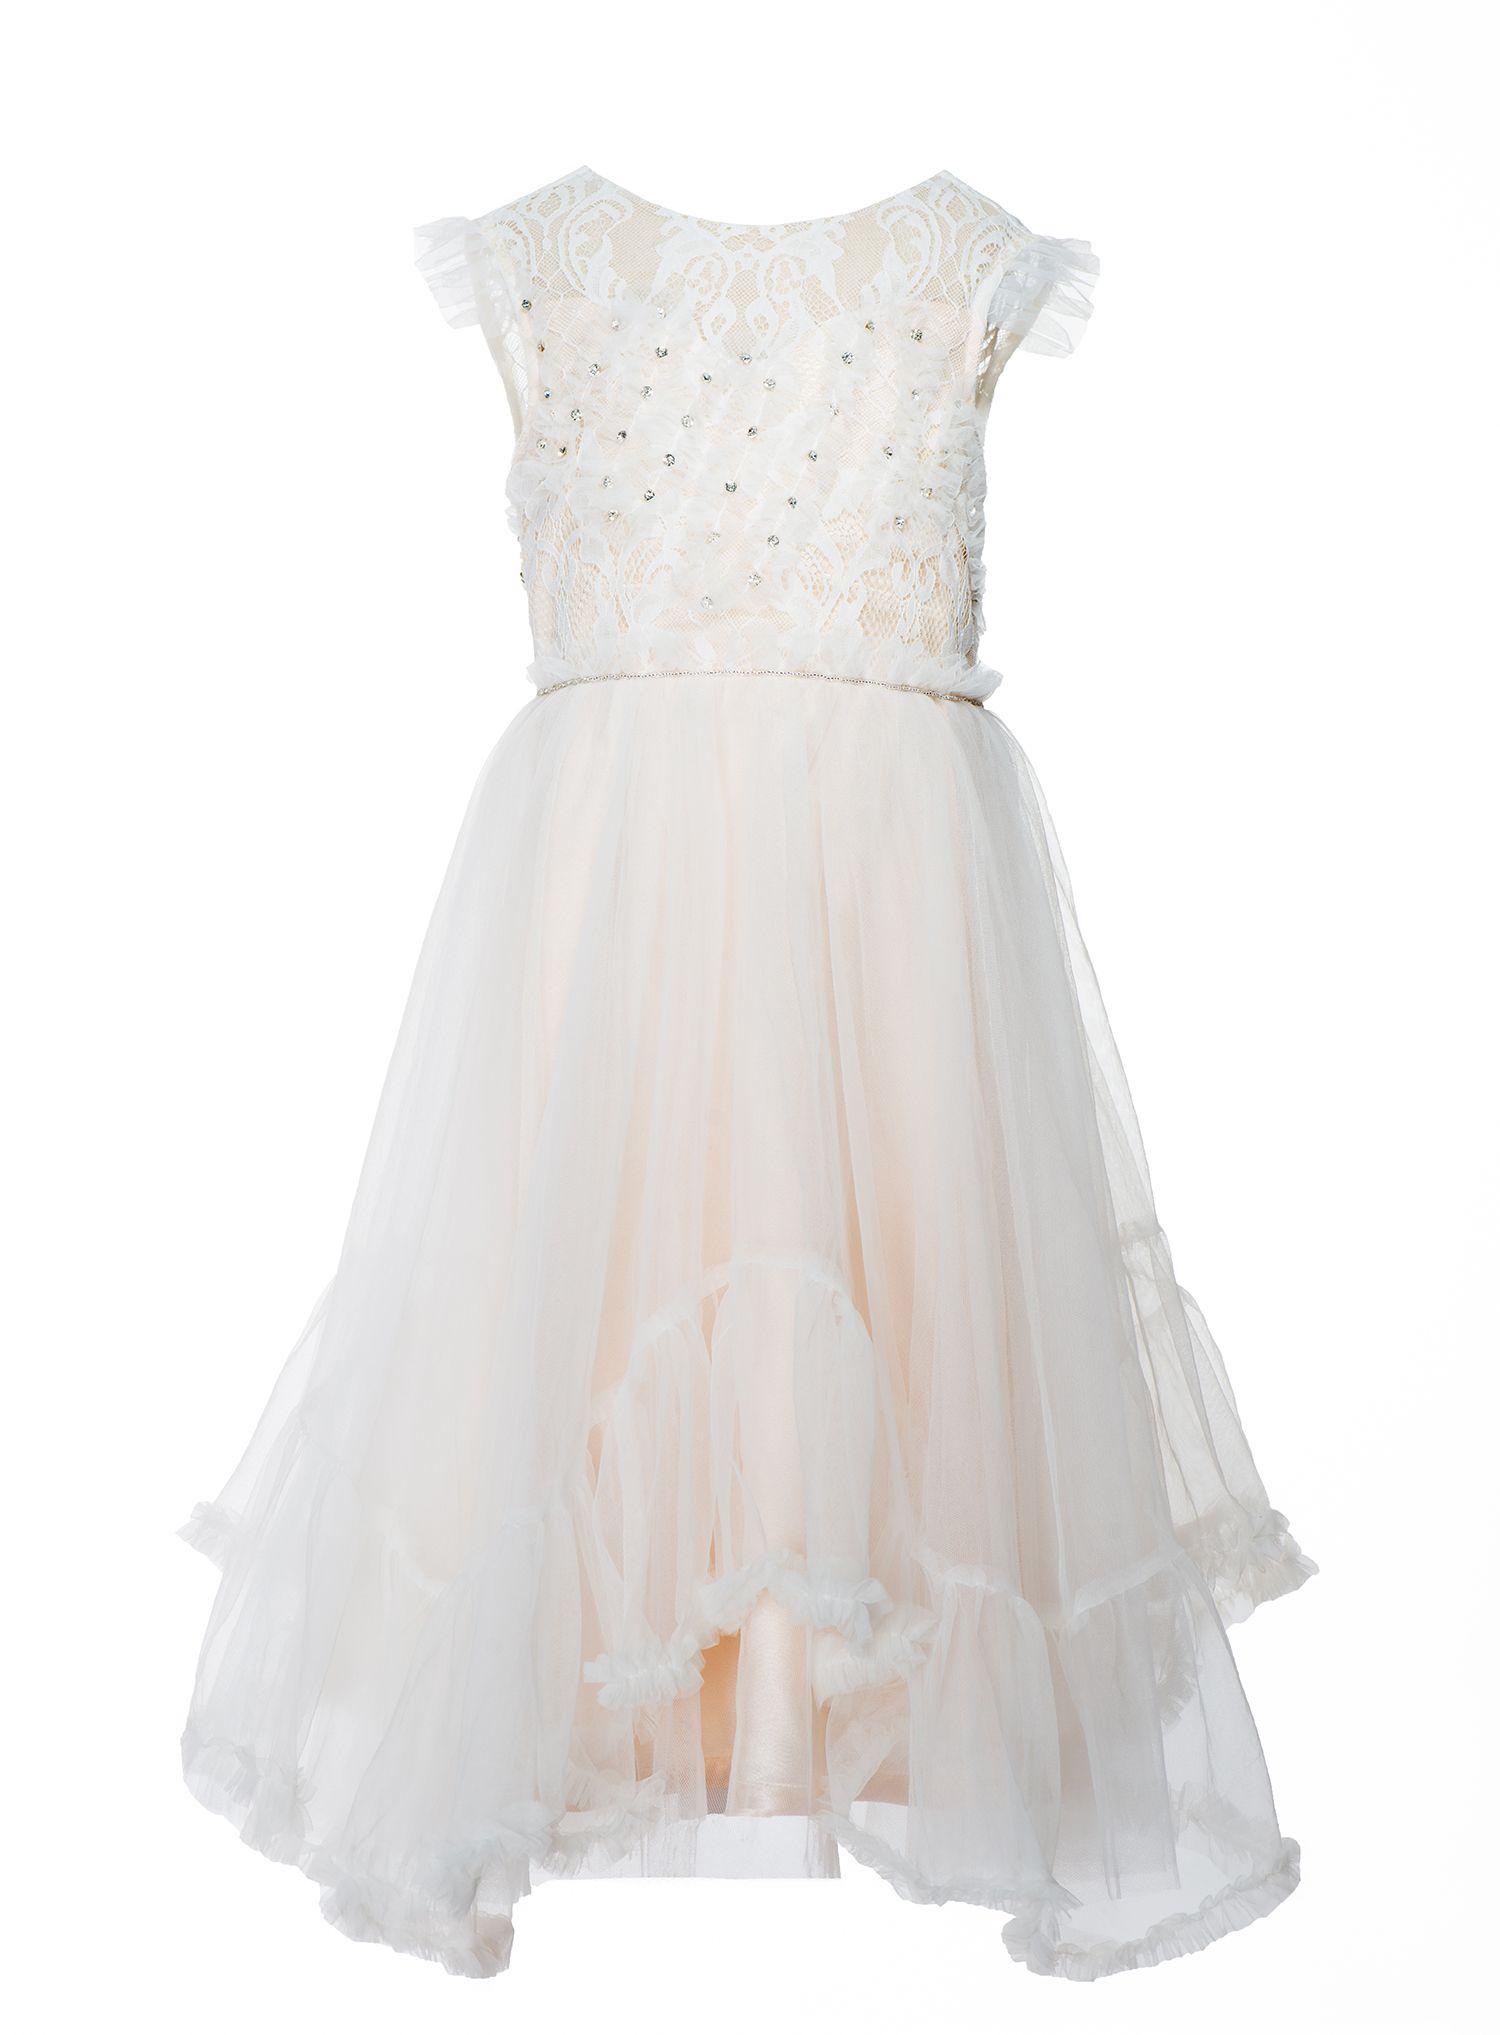 BRIL Ivory Flower Girl Dress AMORIA KIDS Sydney